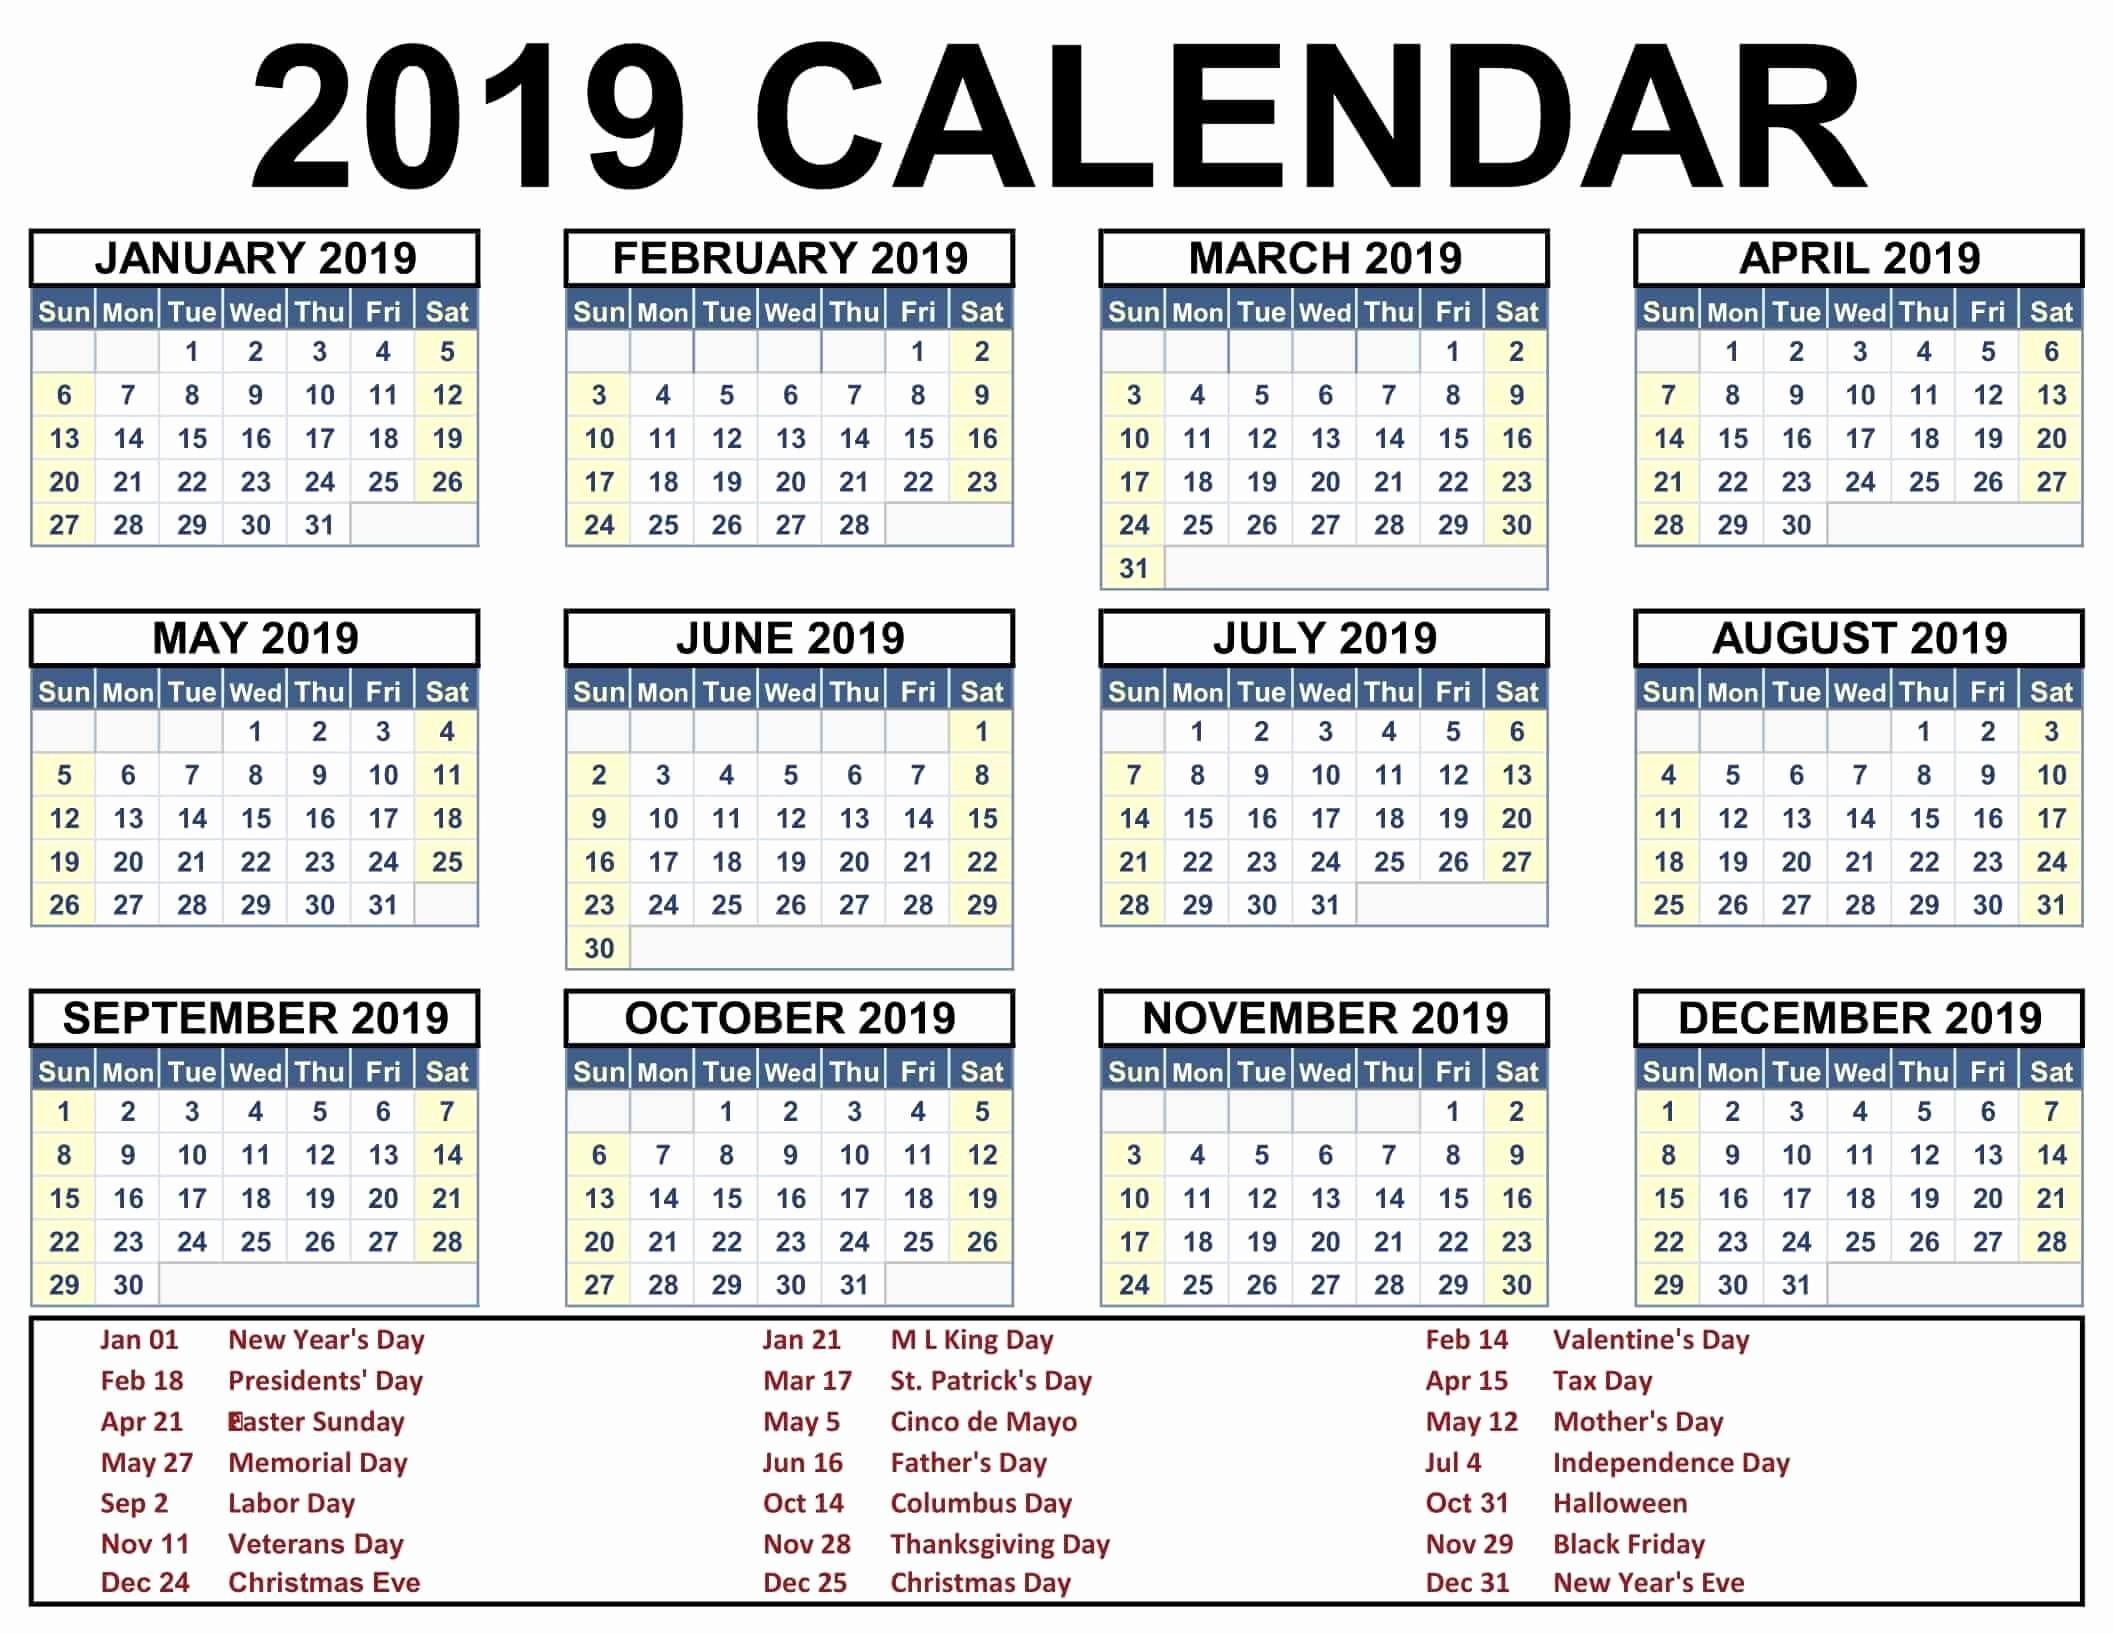 Luxury 32 Examples Hanukkah 2019 2020 Calendar | Etxettipia-Jewish Holidays Calendar 2020